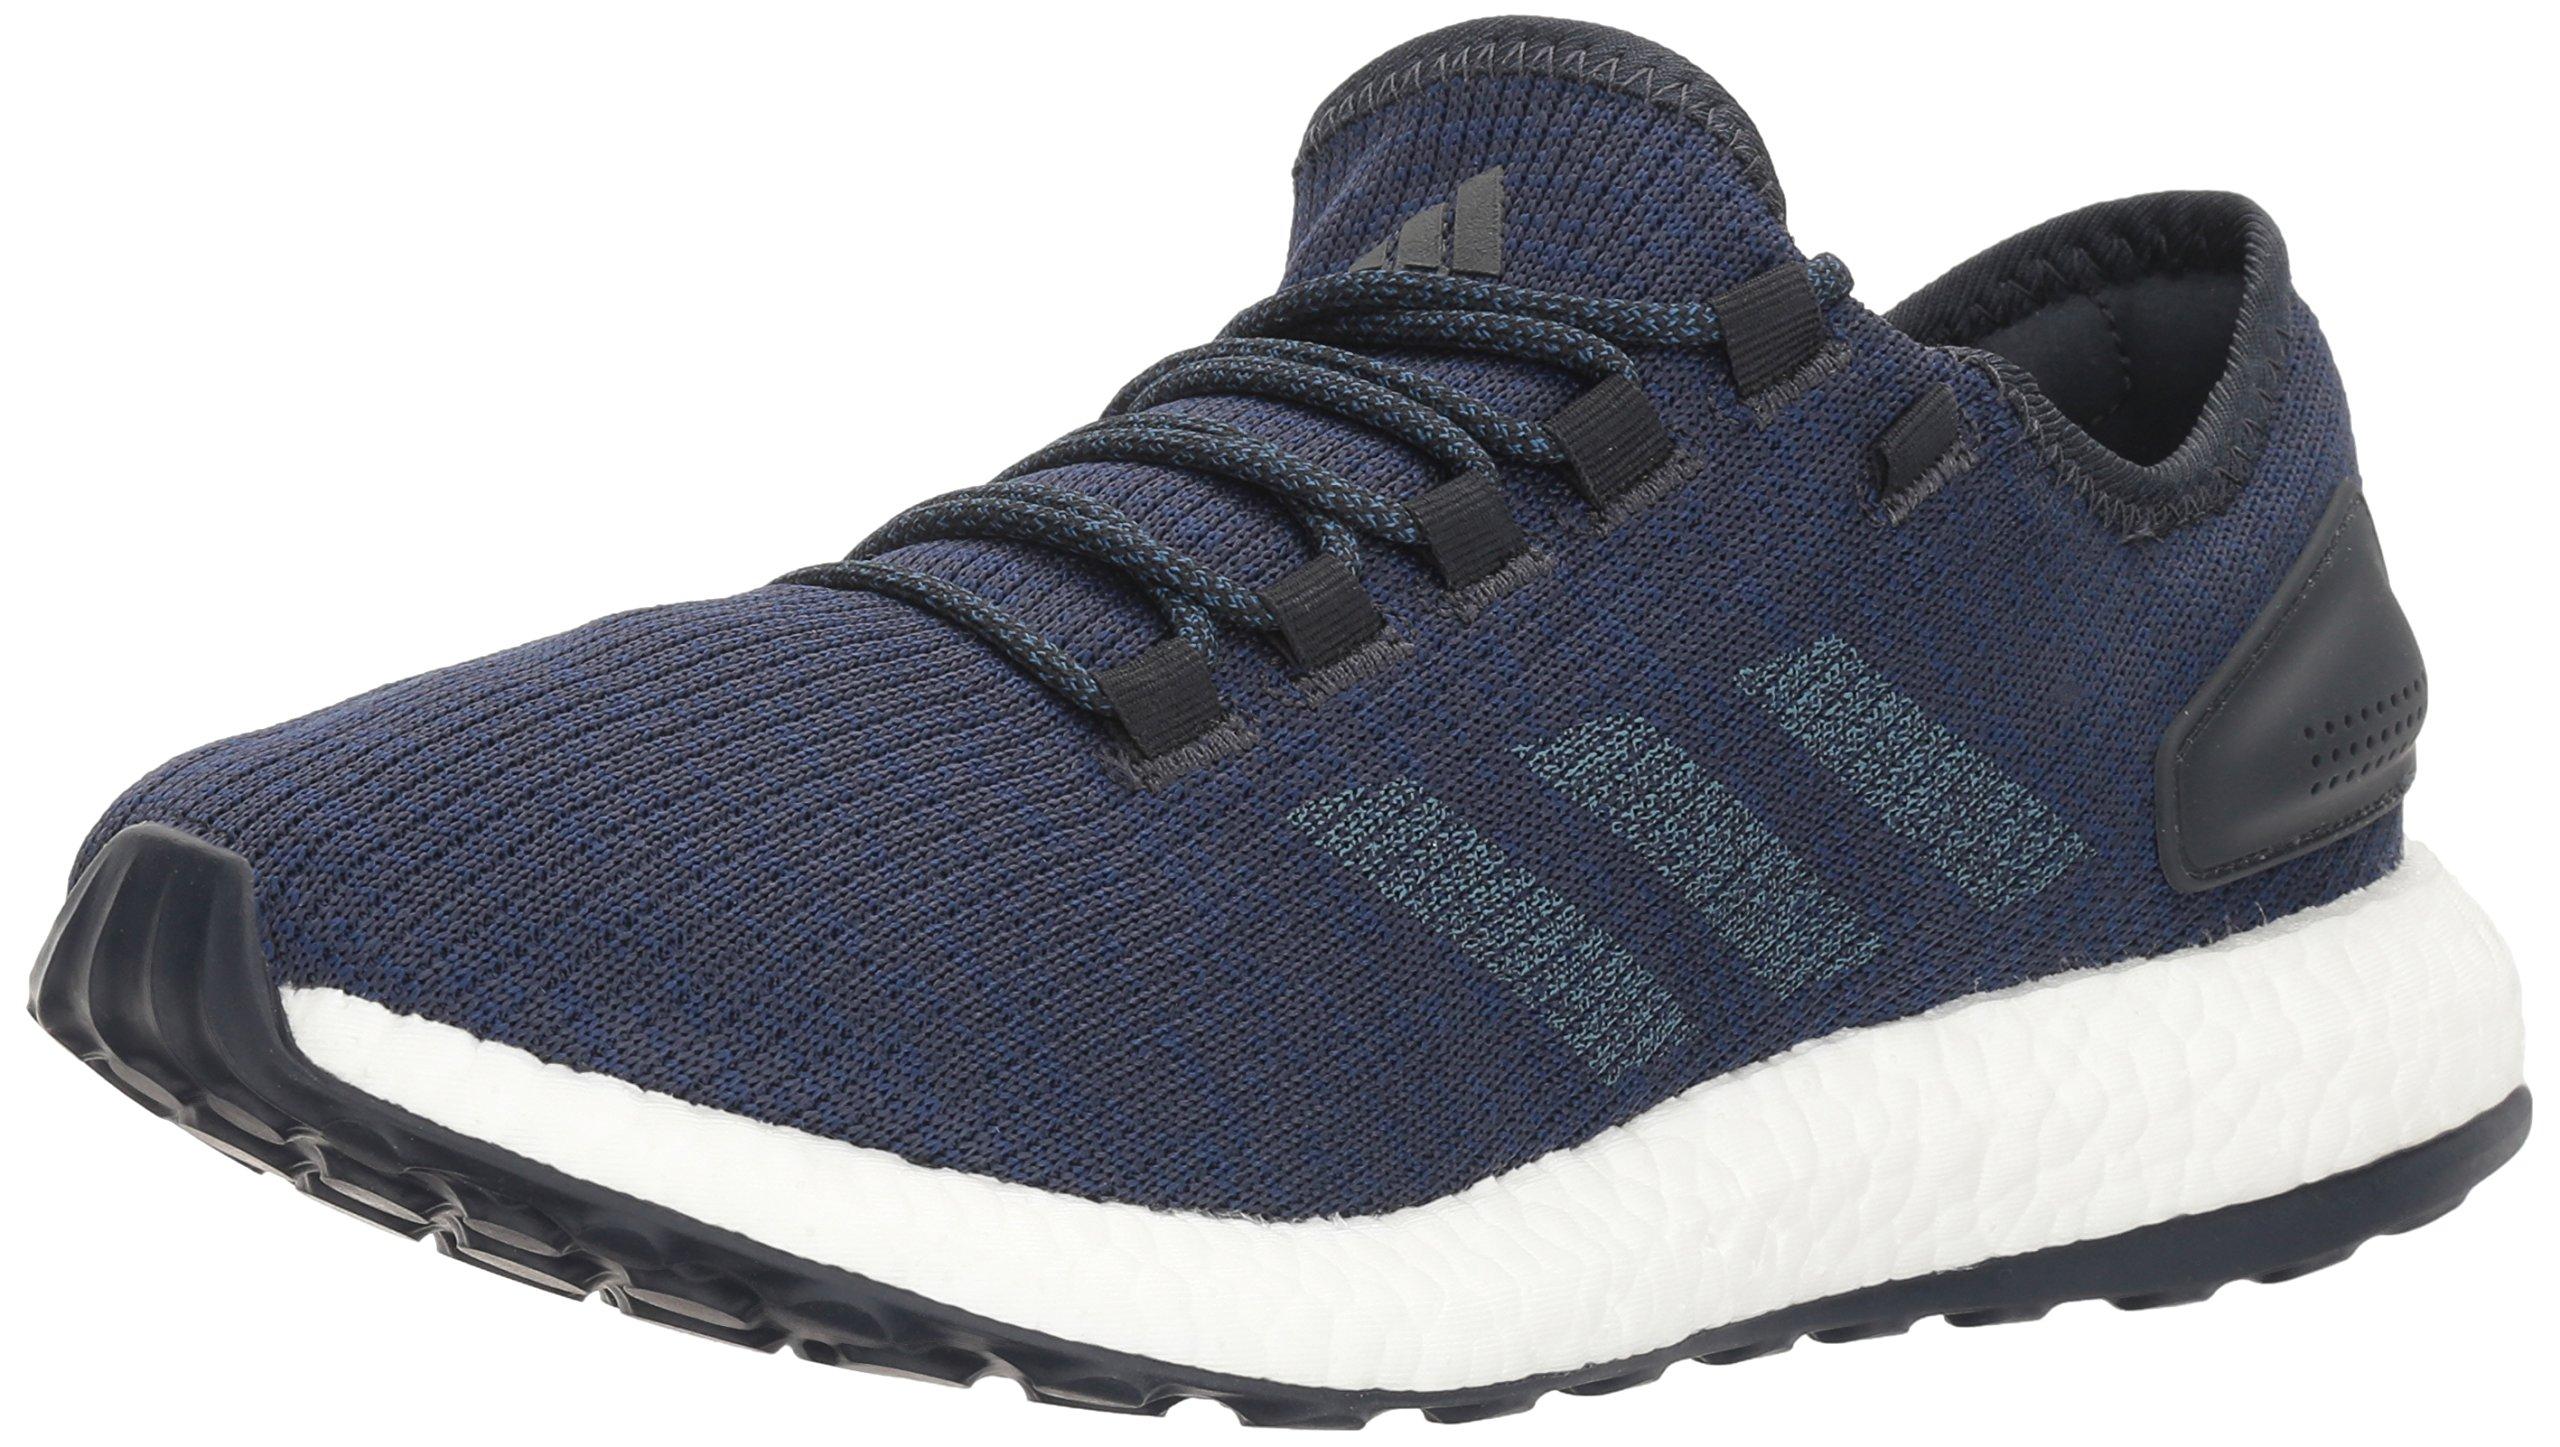 19077f59649a7 Galleon - Adidas Men s Pureboost Running Shoe